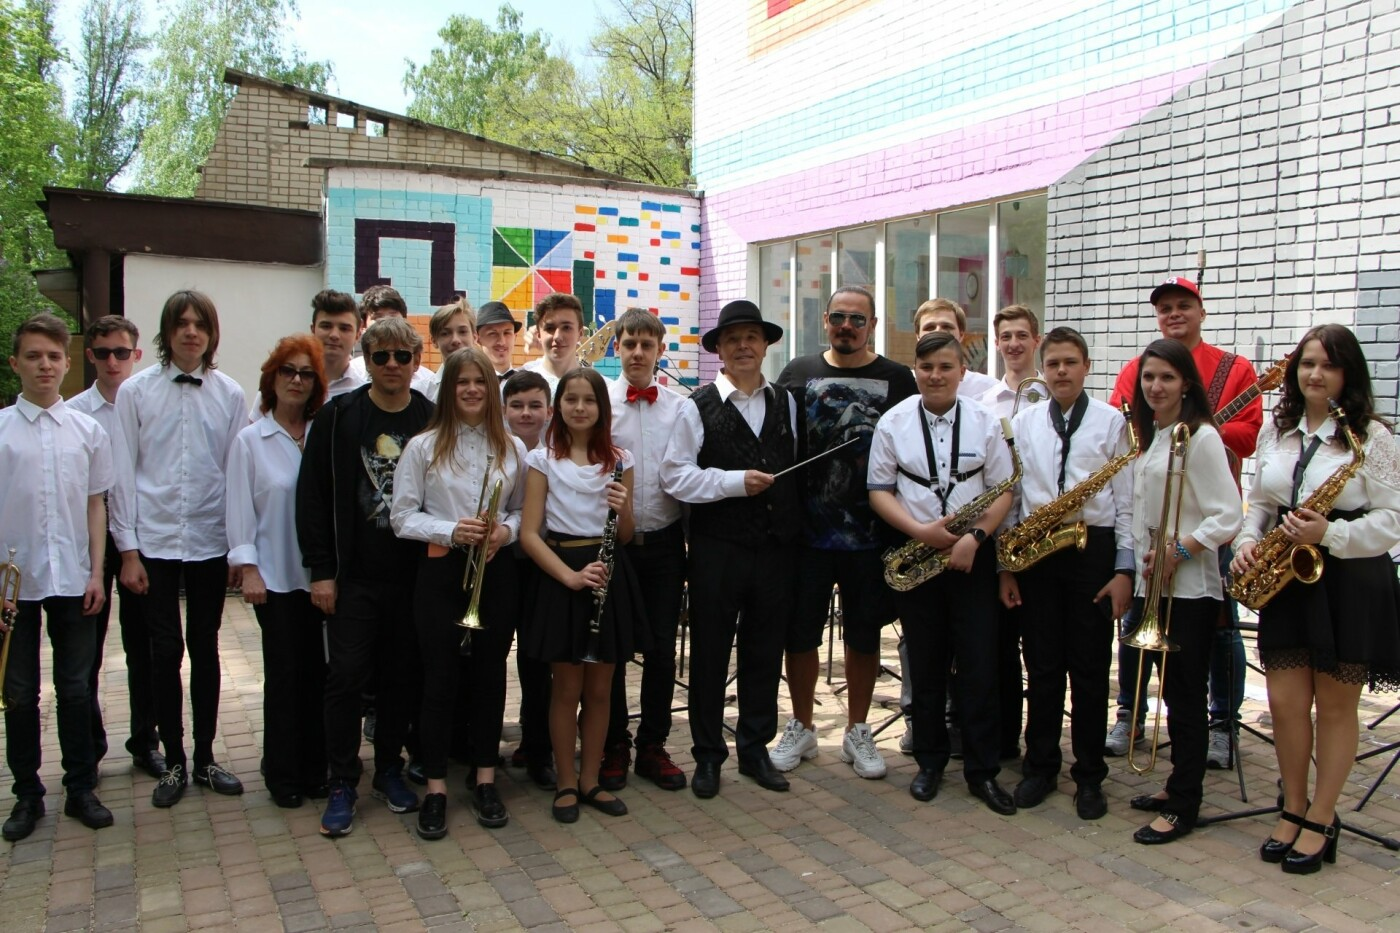 Группа «Танок на майдані Конго» записала клип с запорожскими детьми-музыкантами, – ФОТО, фото-8